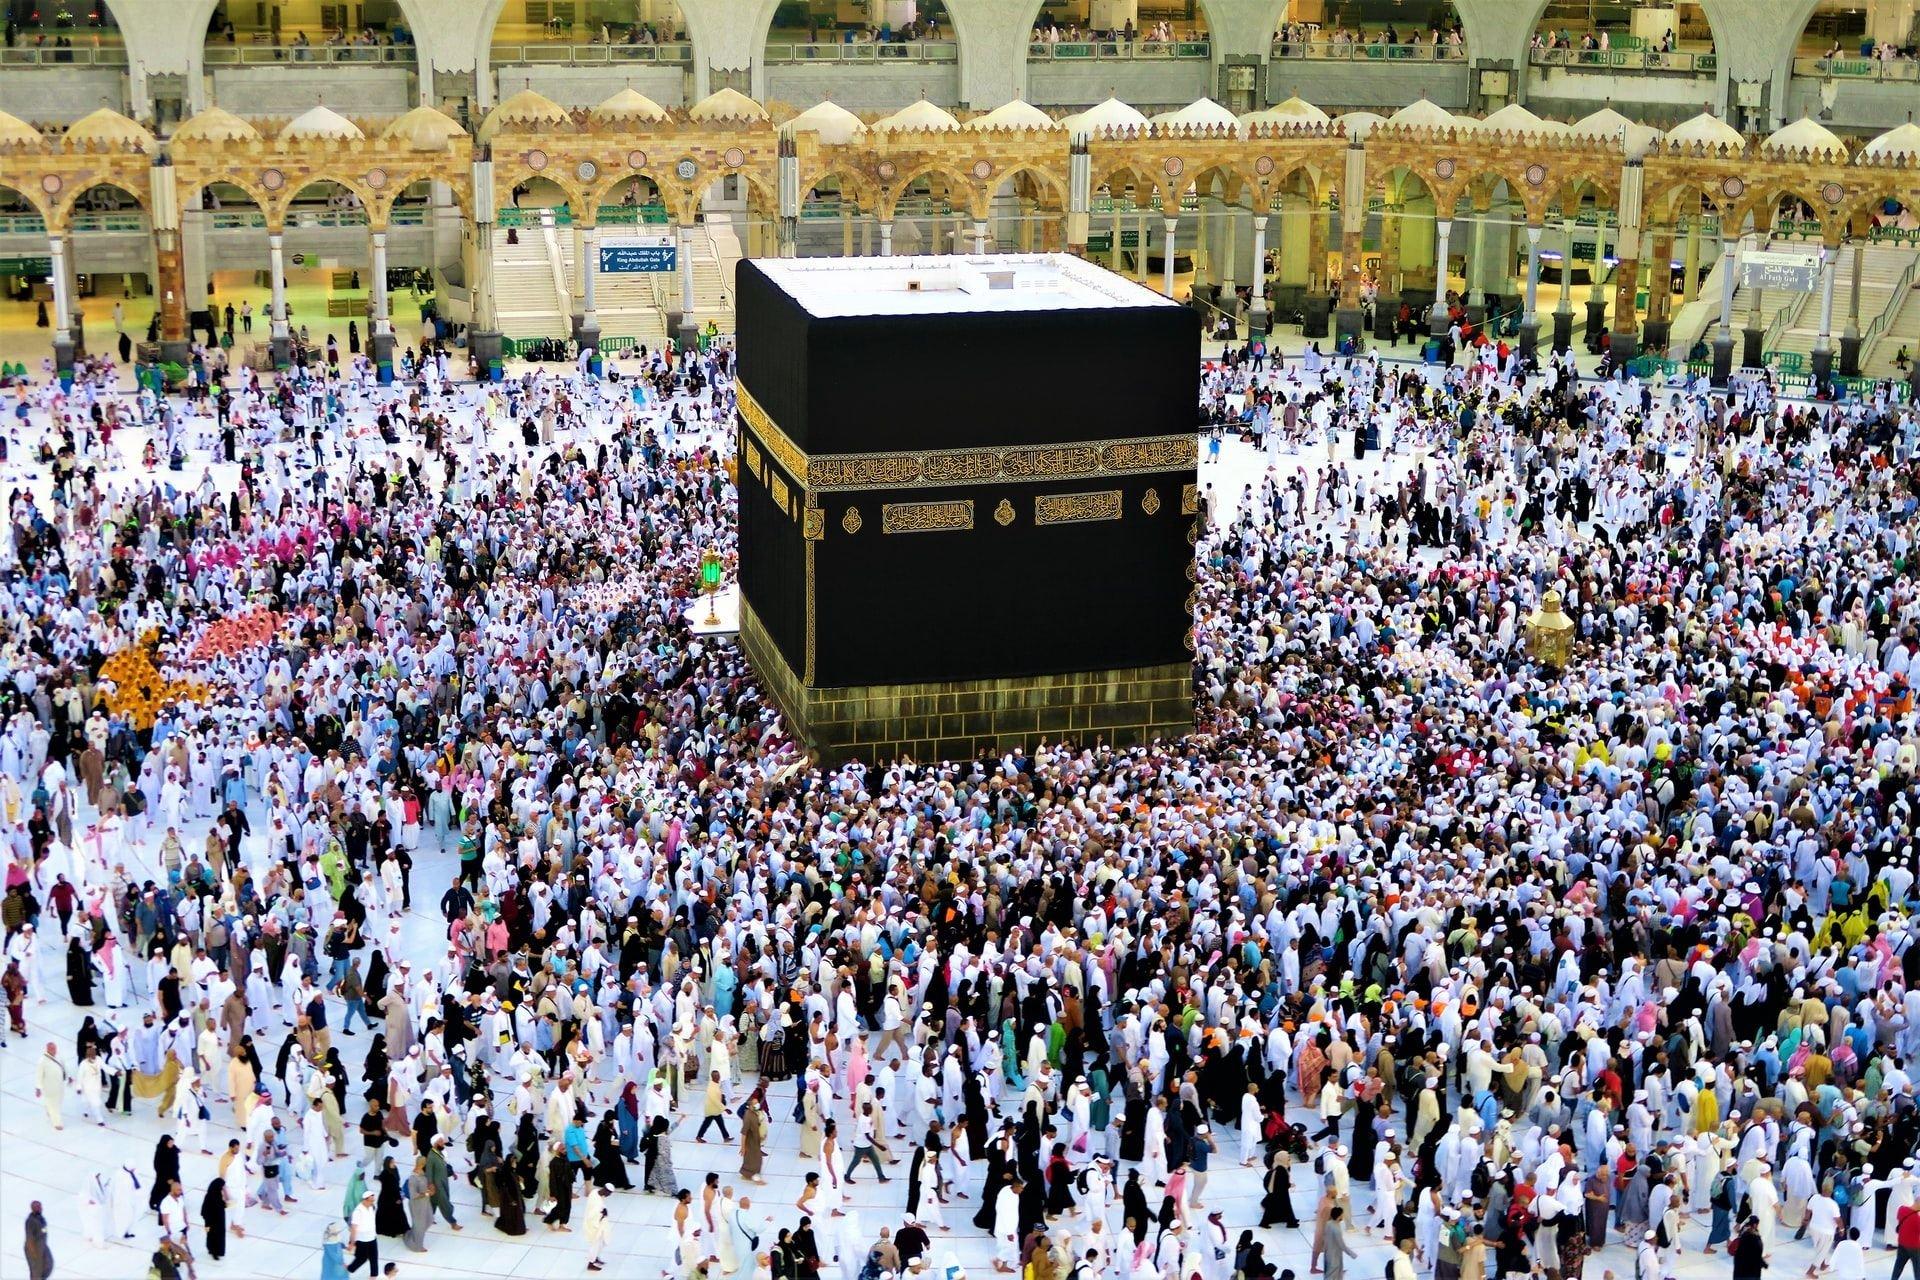 Kaaba Masjid Al-Haram Makkah Mecca Saudi Arabia